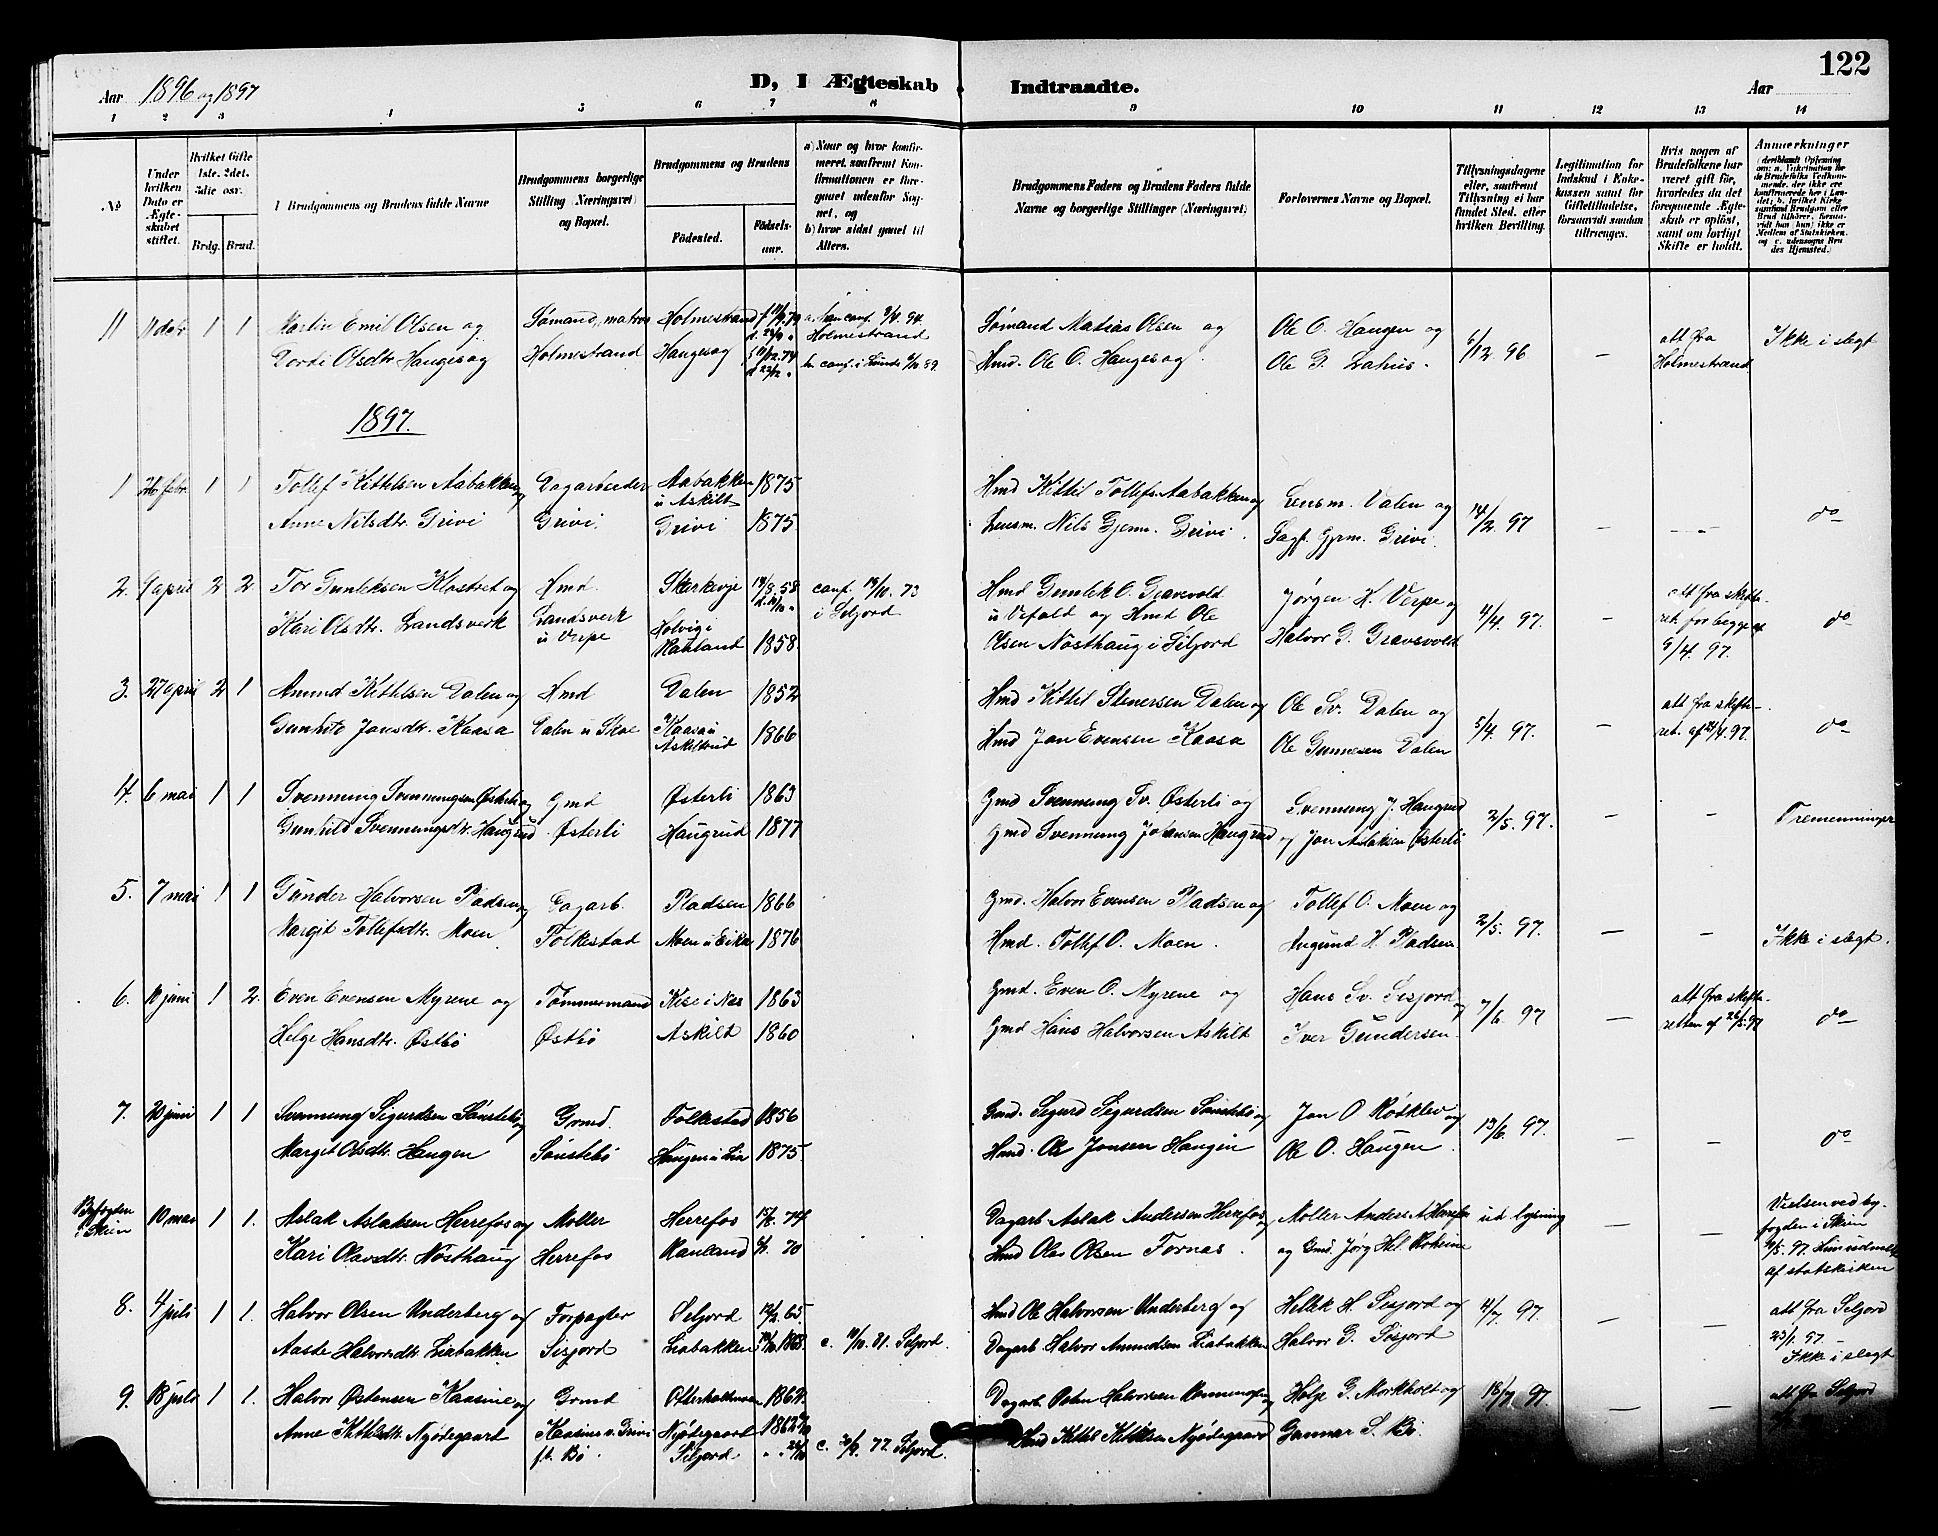 SAKO, Bø kirkebøker, G/Ga/L0006: Klokkerbok nr. 6, 1898-1909, s. 122